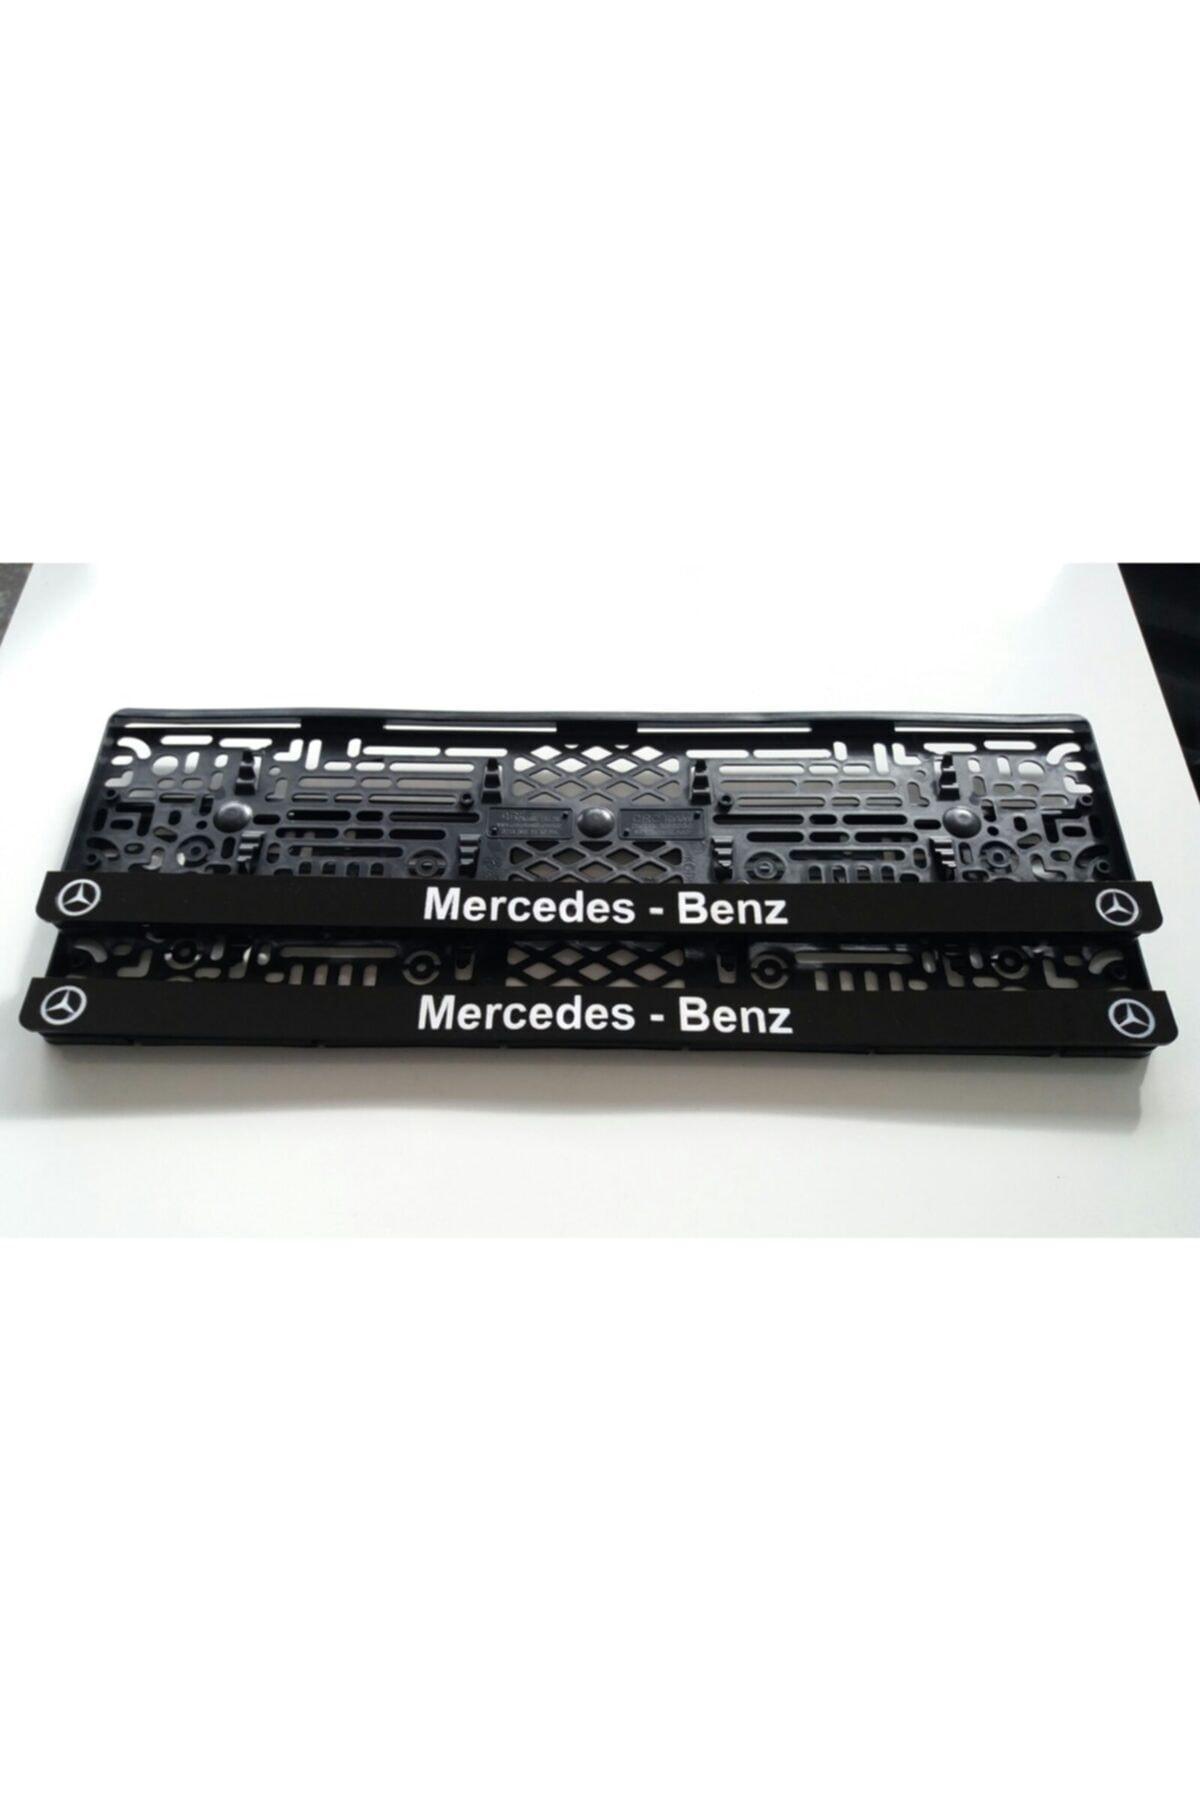 3M Mercedes Benz Yazılı Takmatik Lazer Kesim Pleksi Plakalık 1